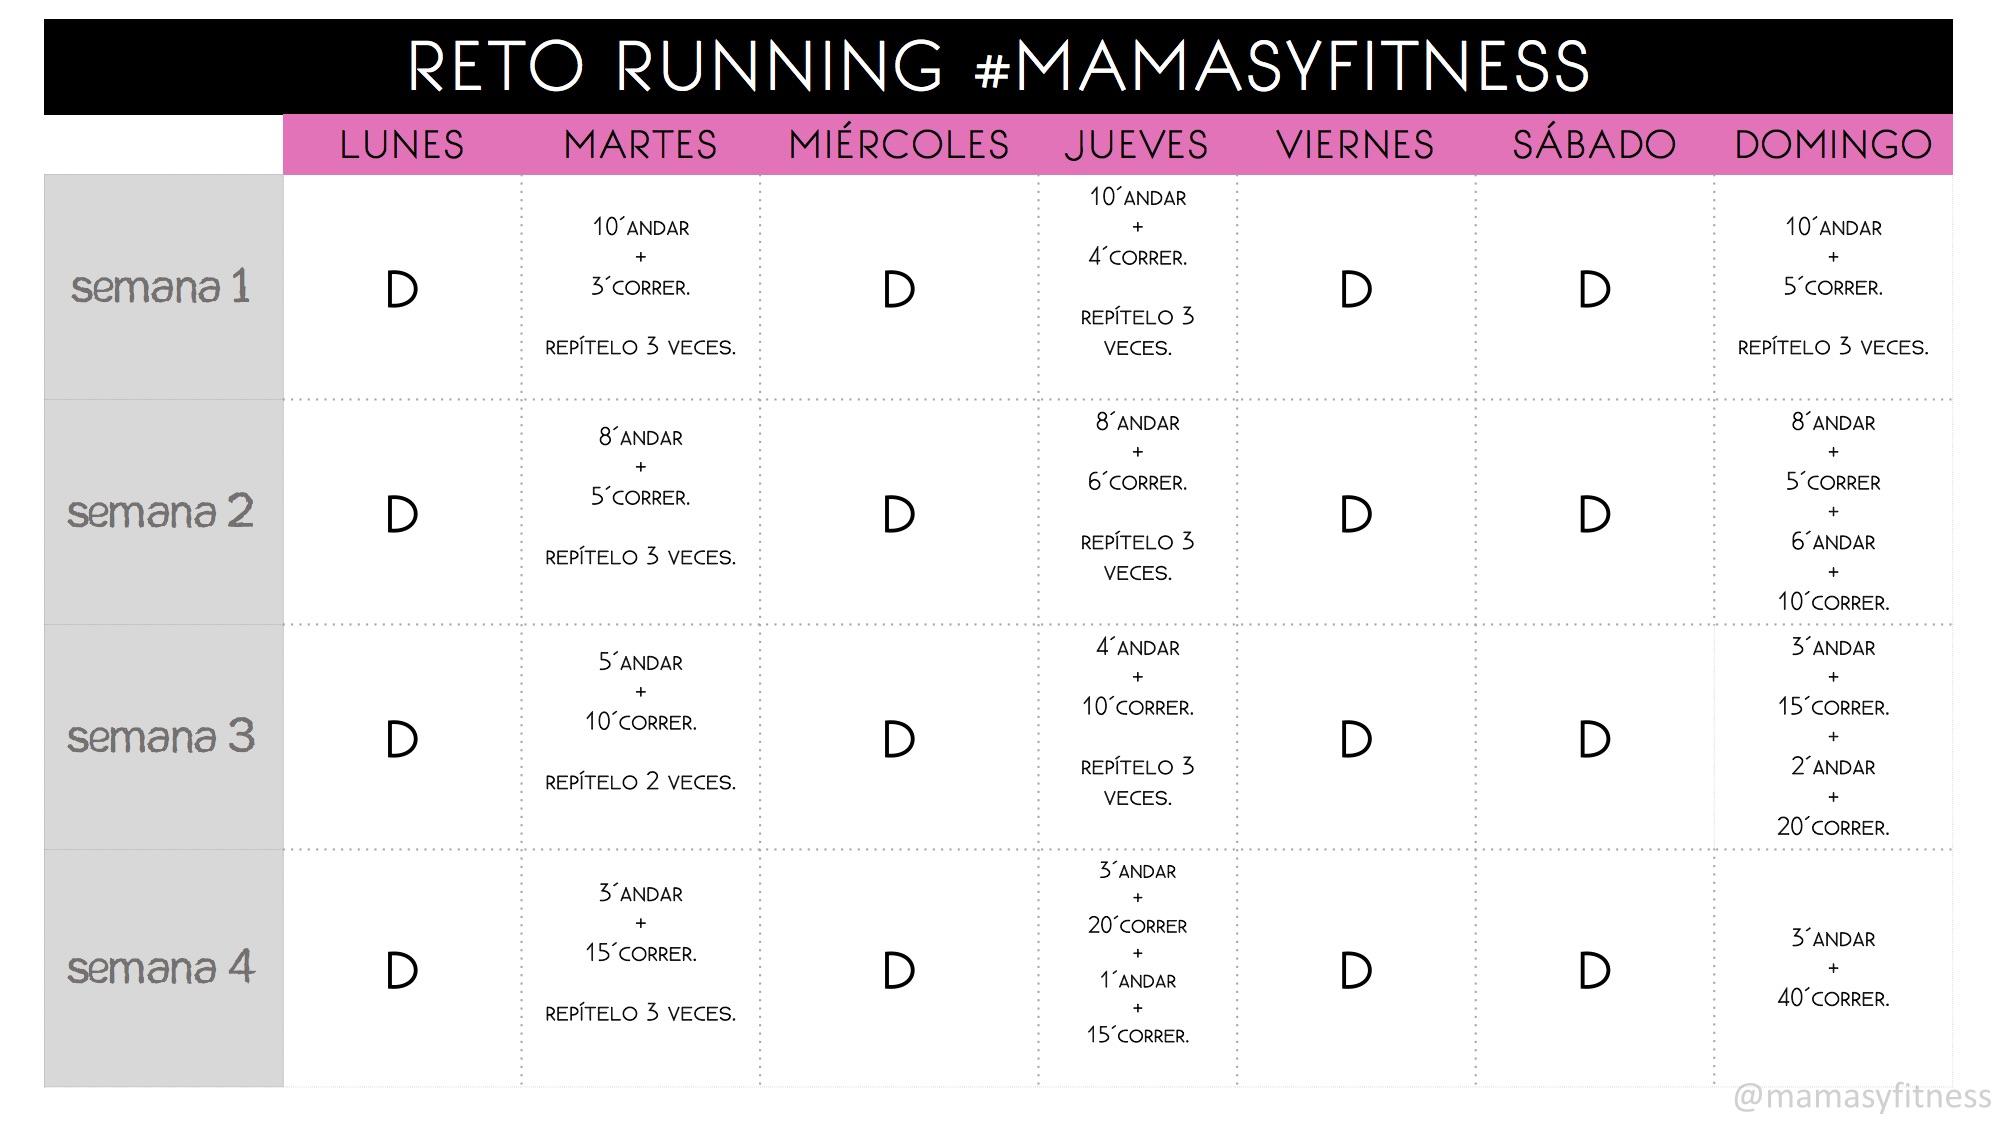 RETO RUNNING MAMASYFITNESS